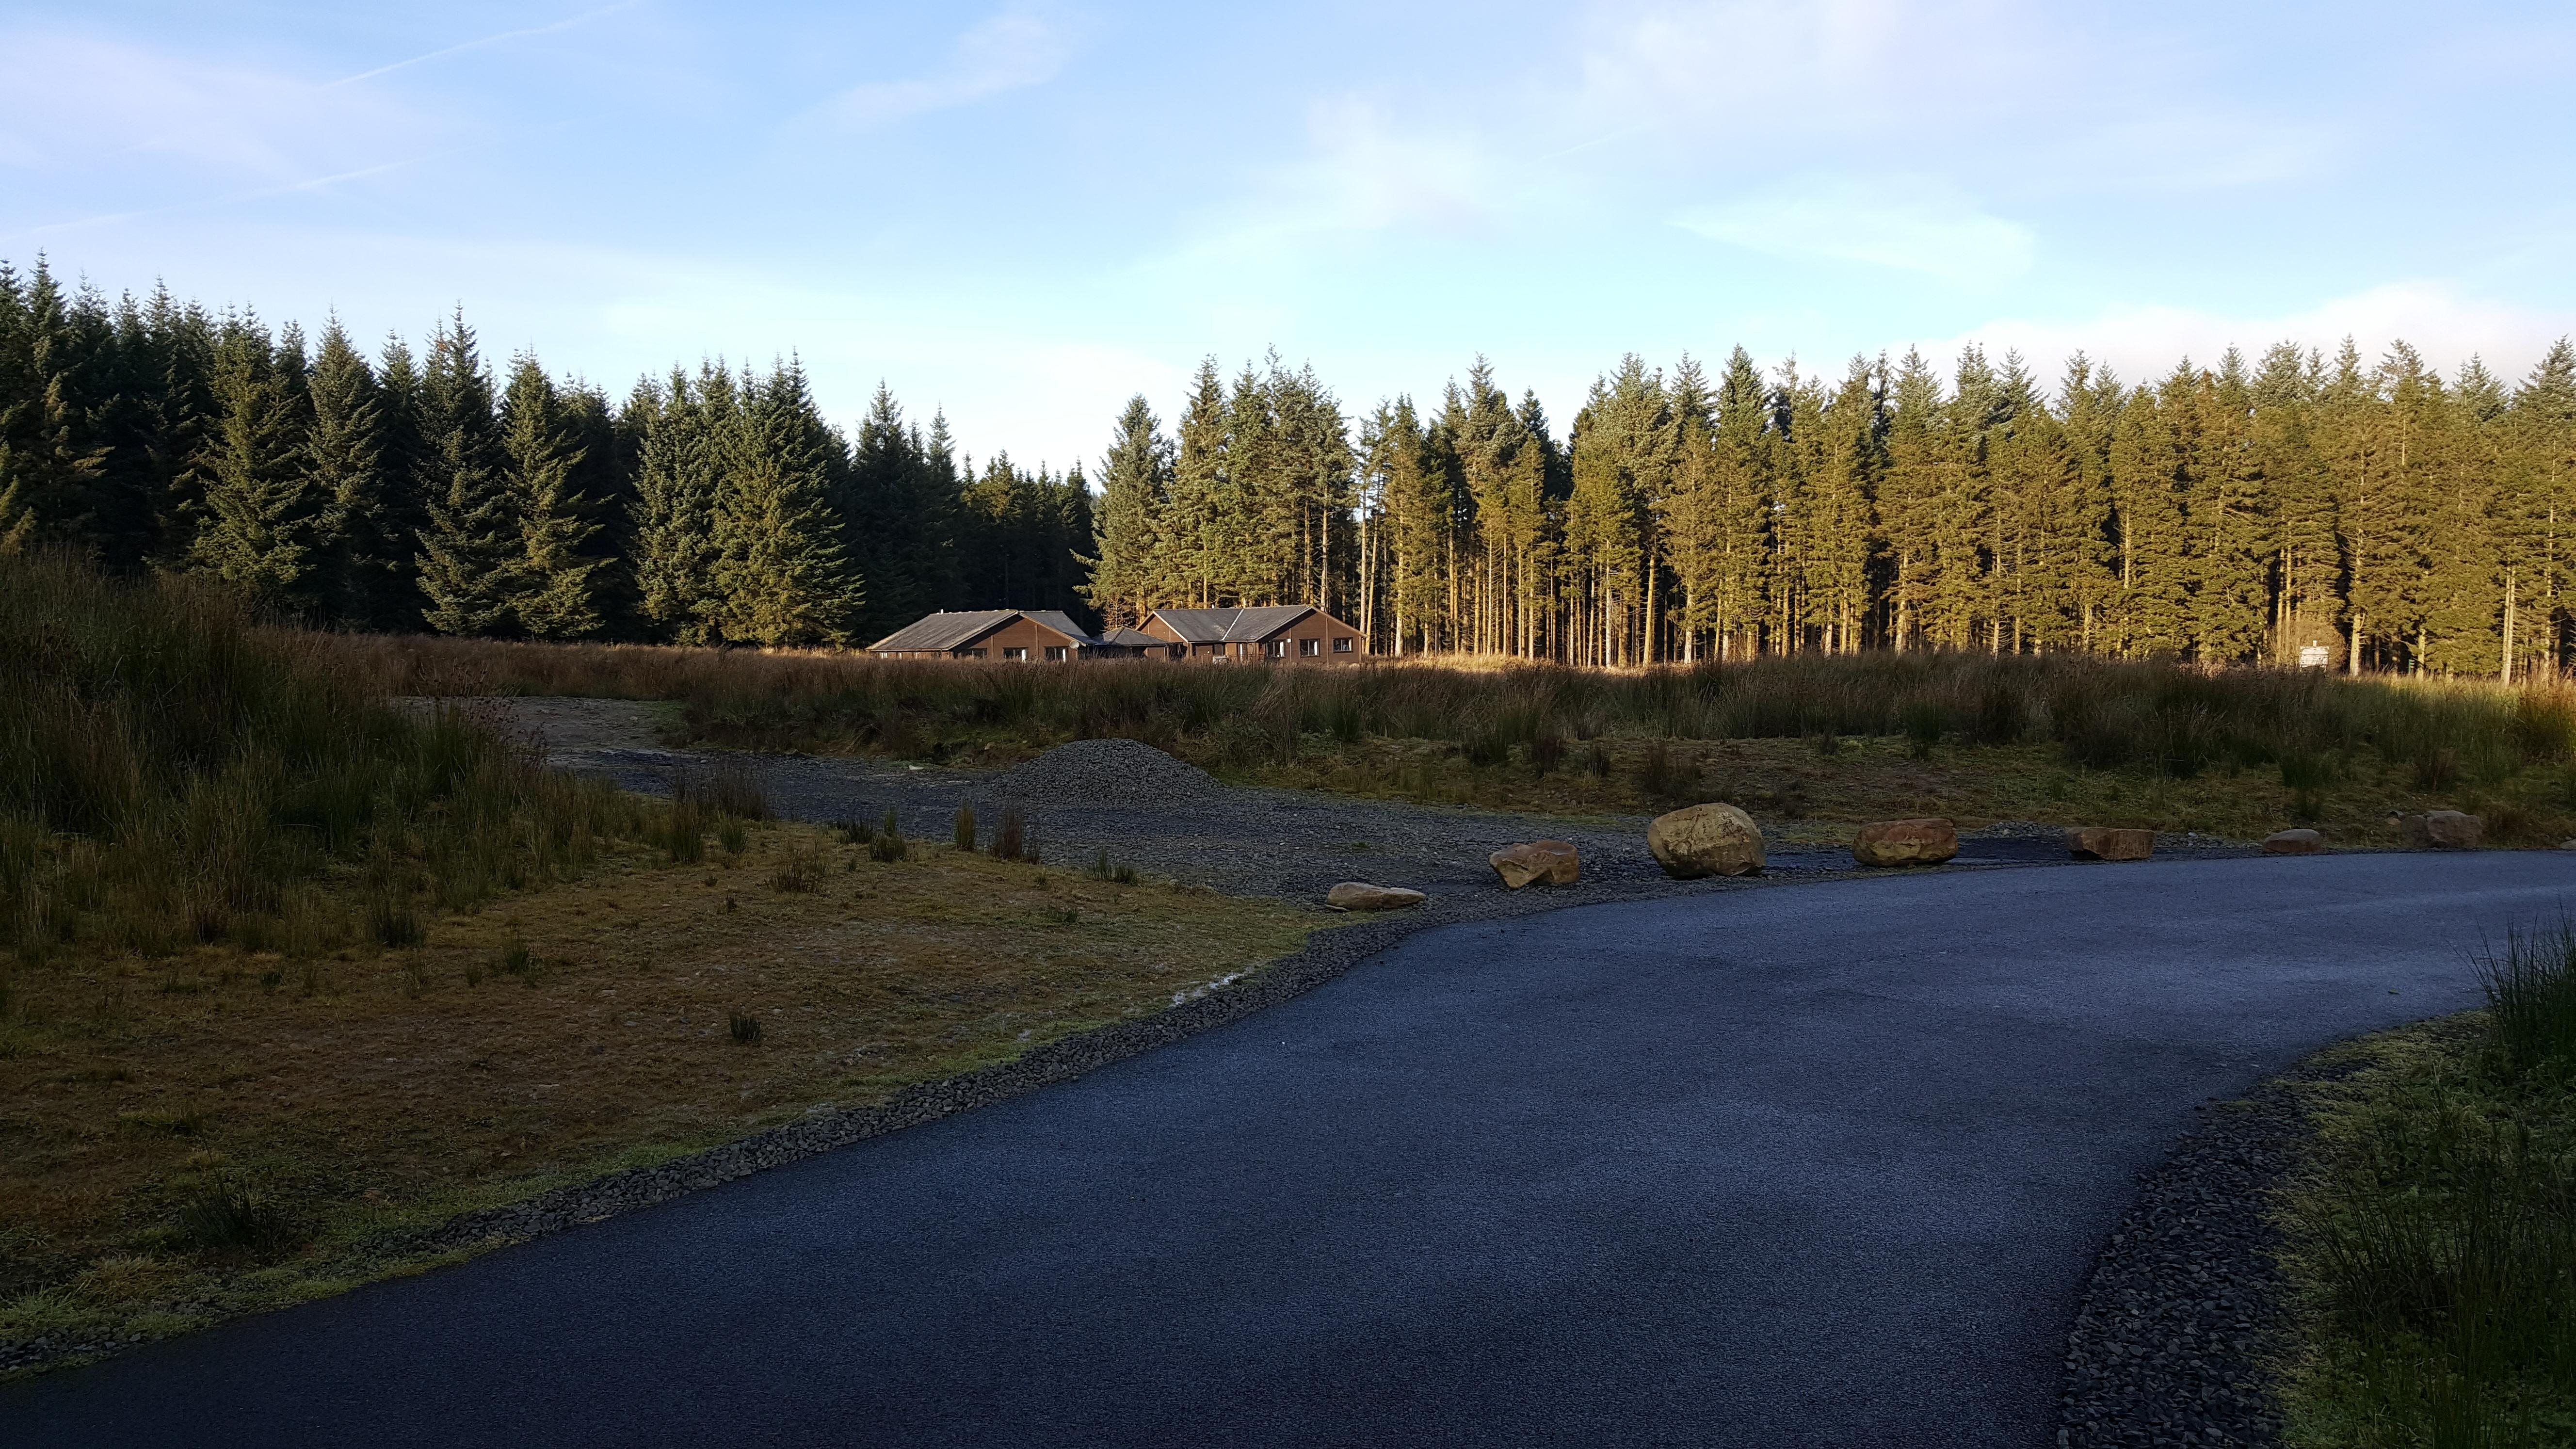 Calvert Trust Kielder Forest